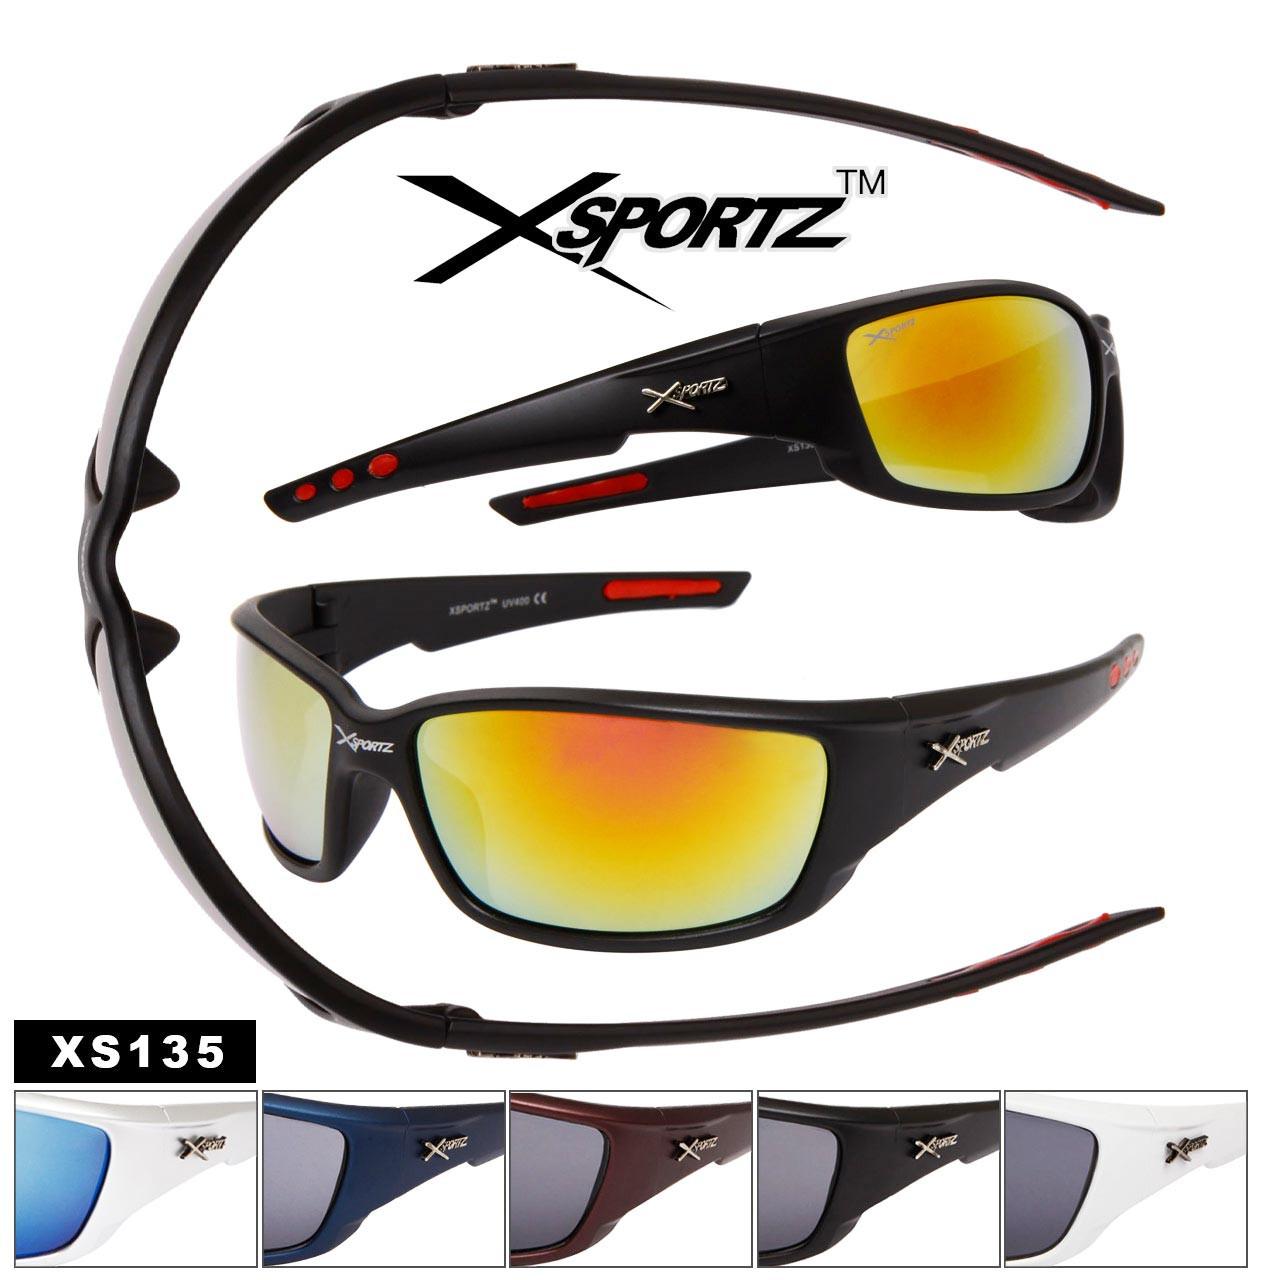 Xsportz™ Sunglasses - Style # XS135